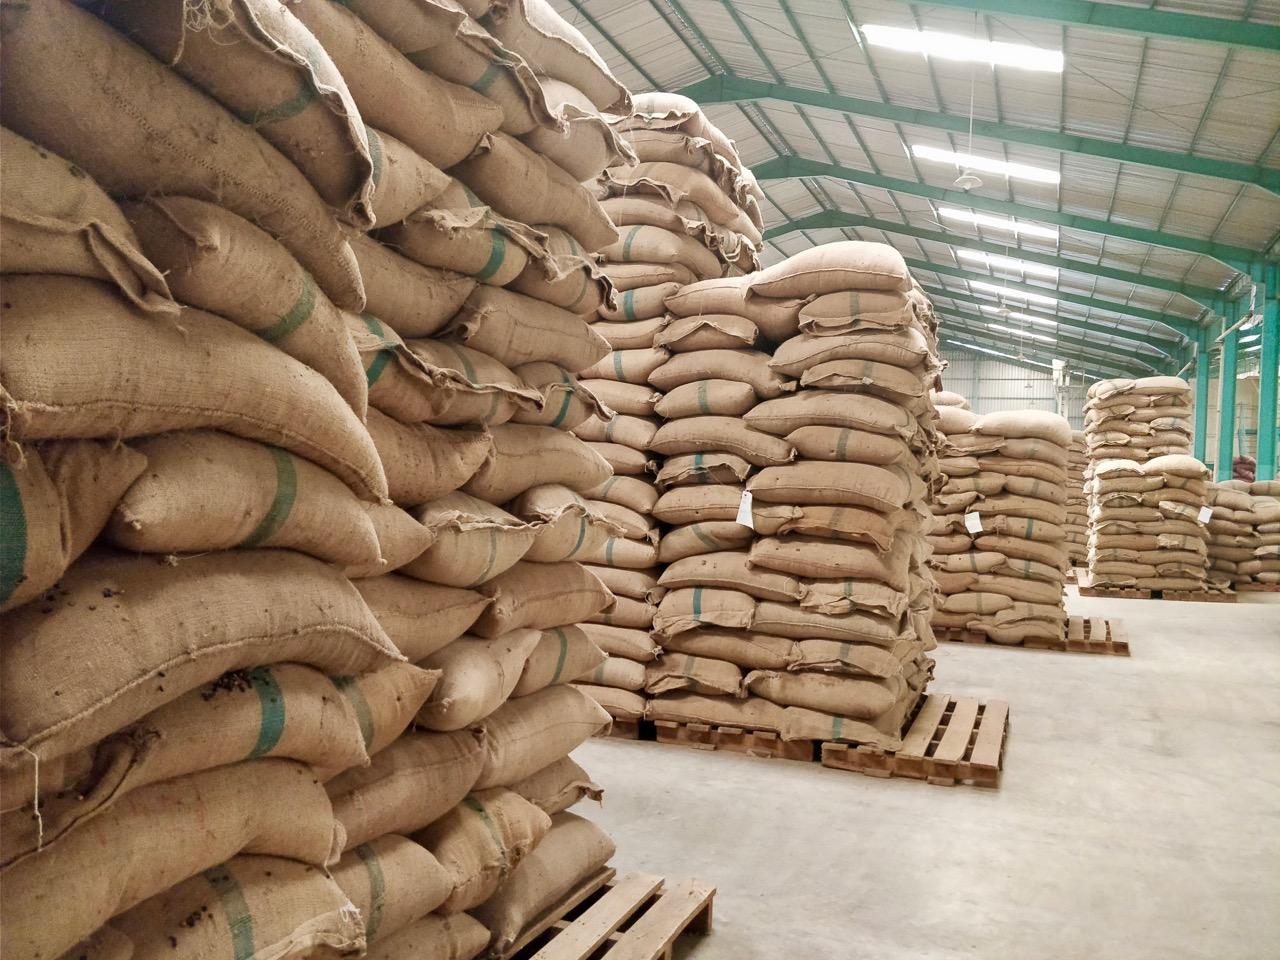 Packed green coffee in jute bags Indonesia Matahari gt